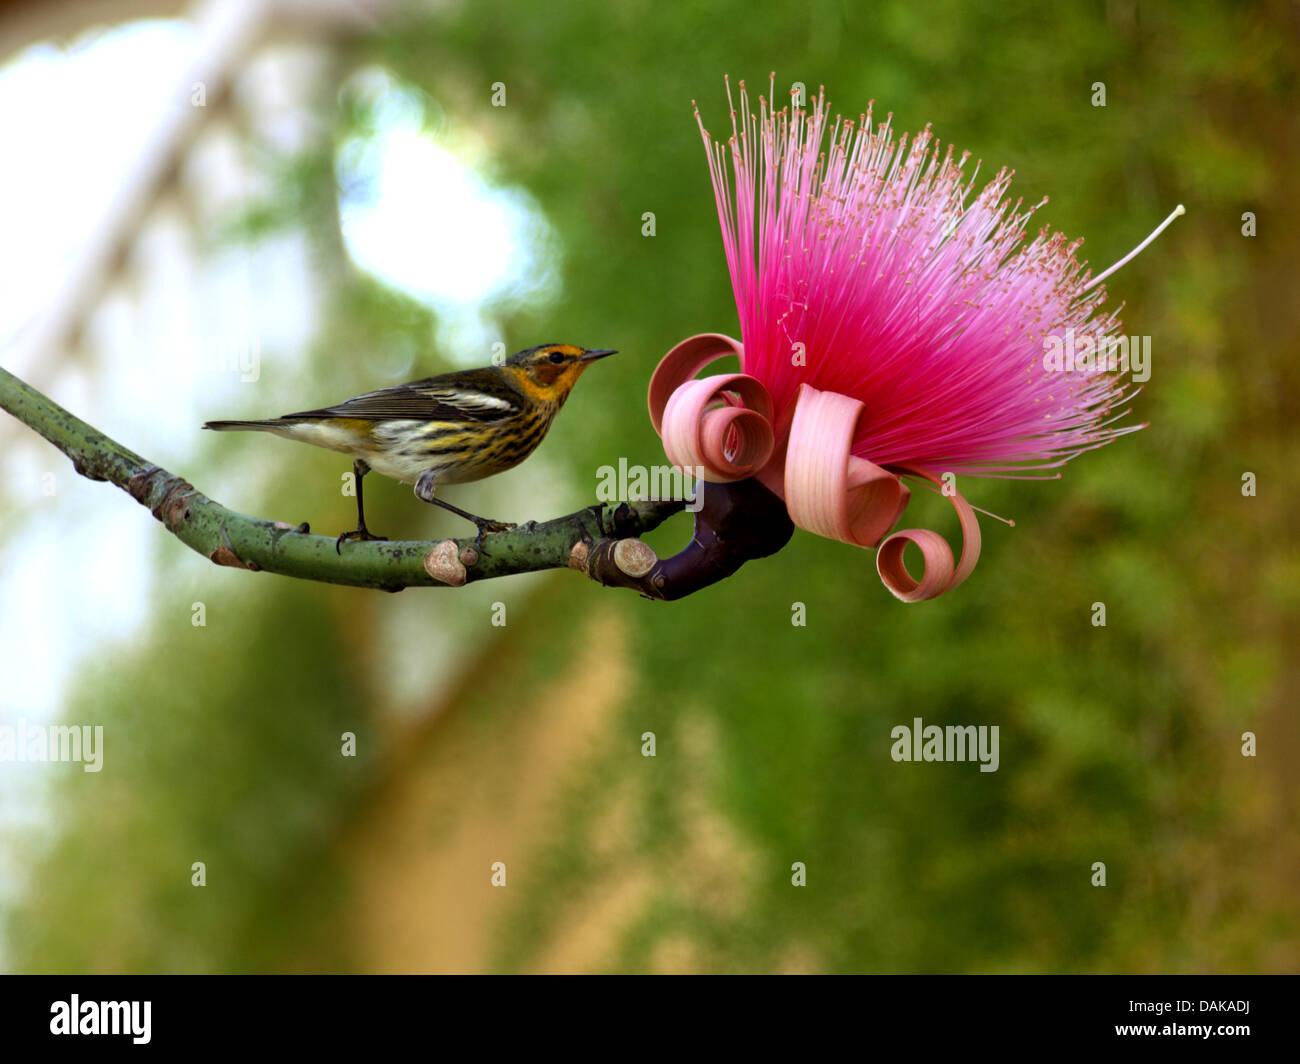 songbird on a twig of Calliandra grandiflora, Cuba - Stock Image